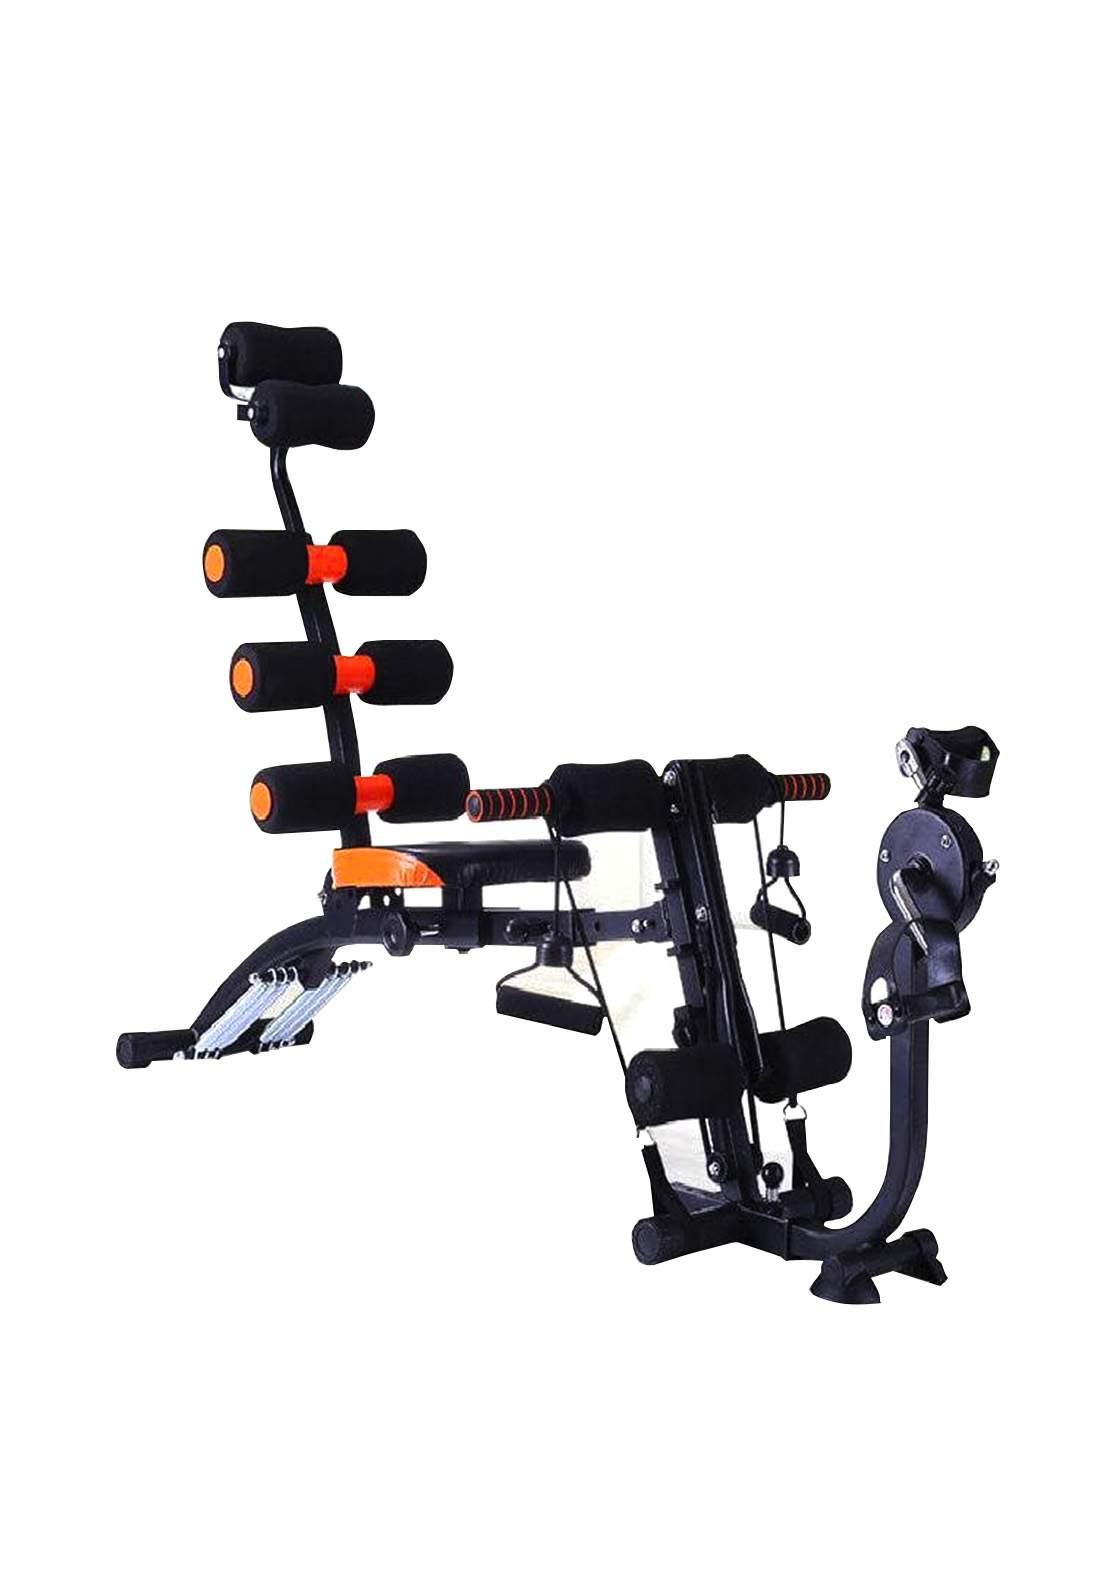 Six Pack Care Chair جهاز تمارين العناية بعضلات البطن